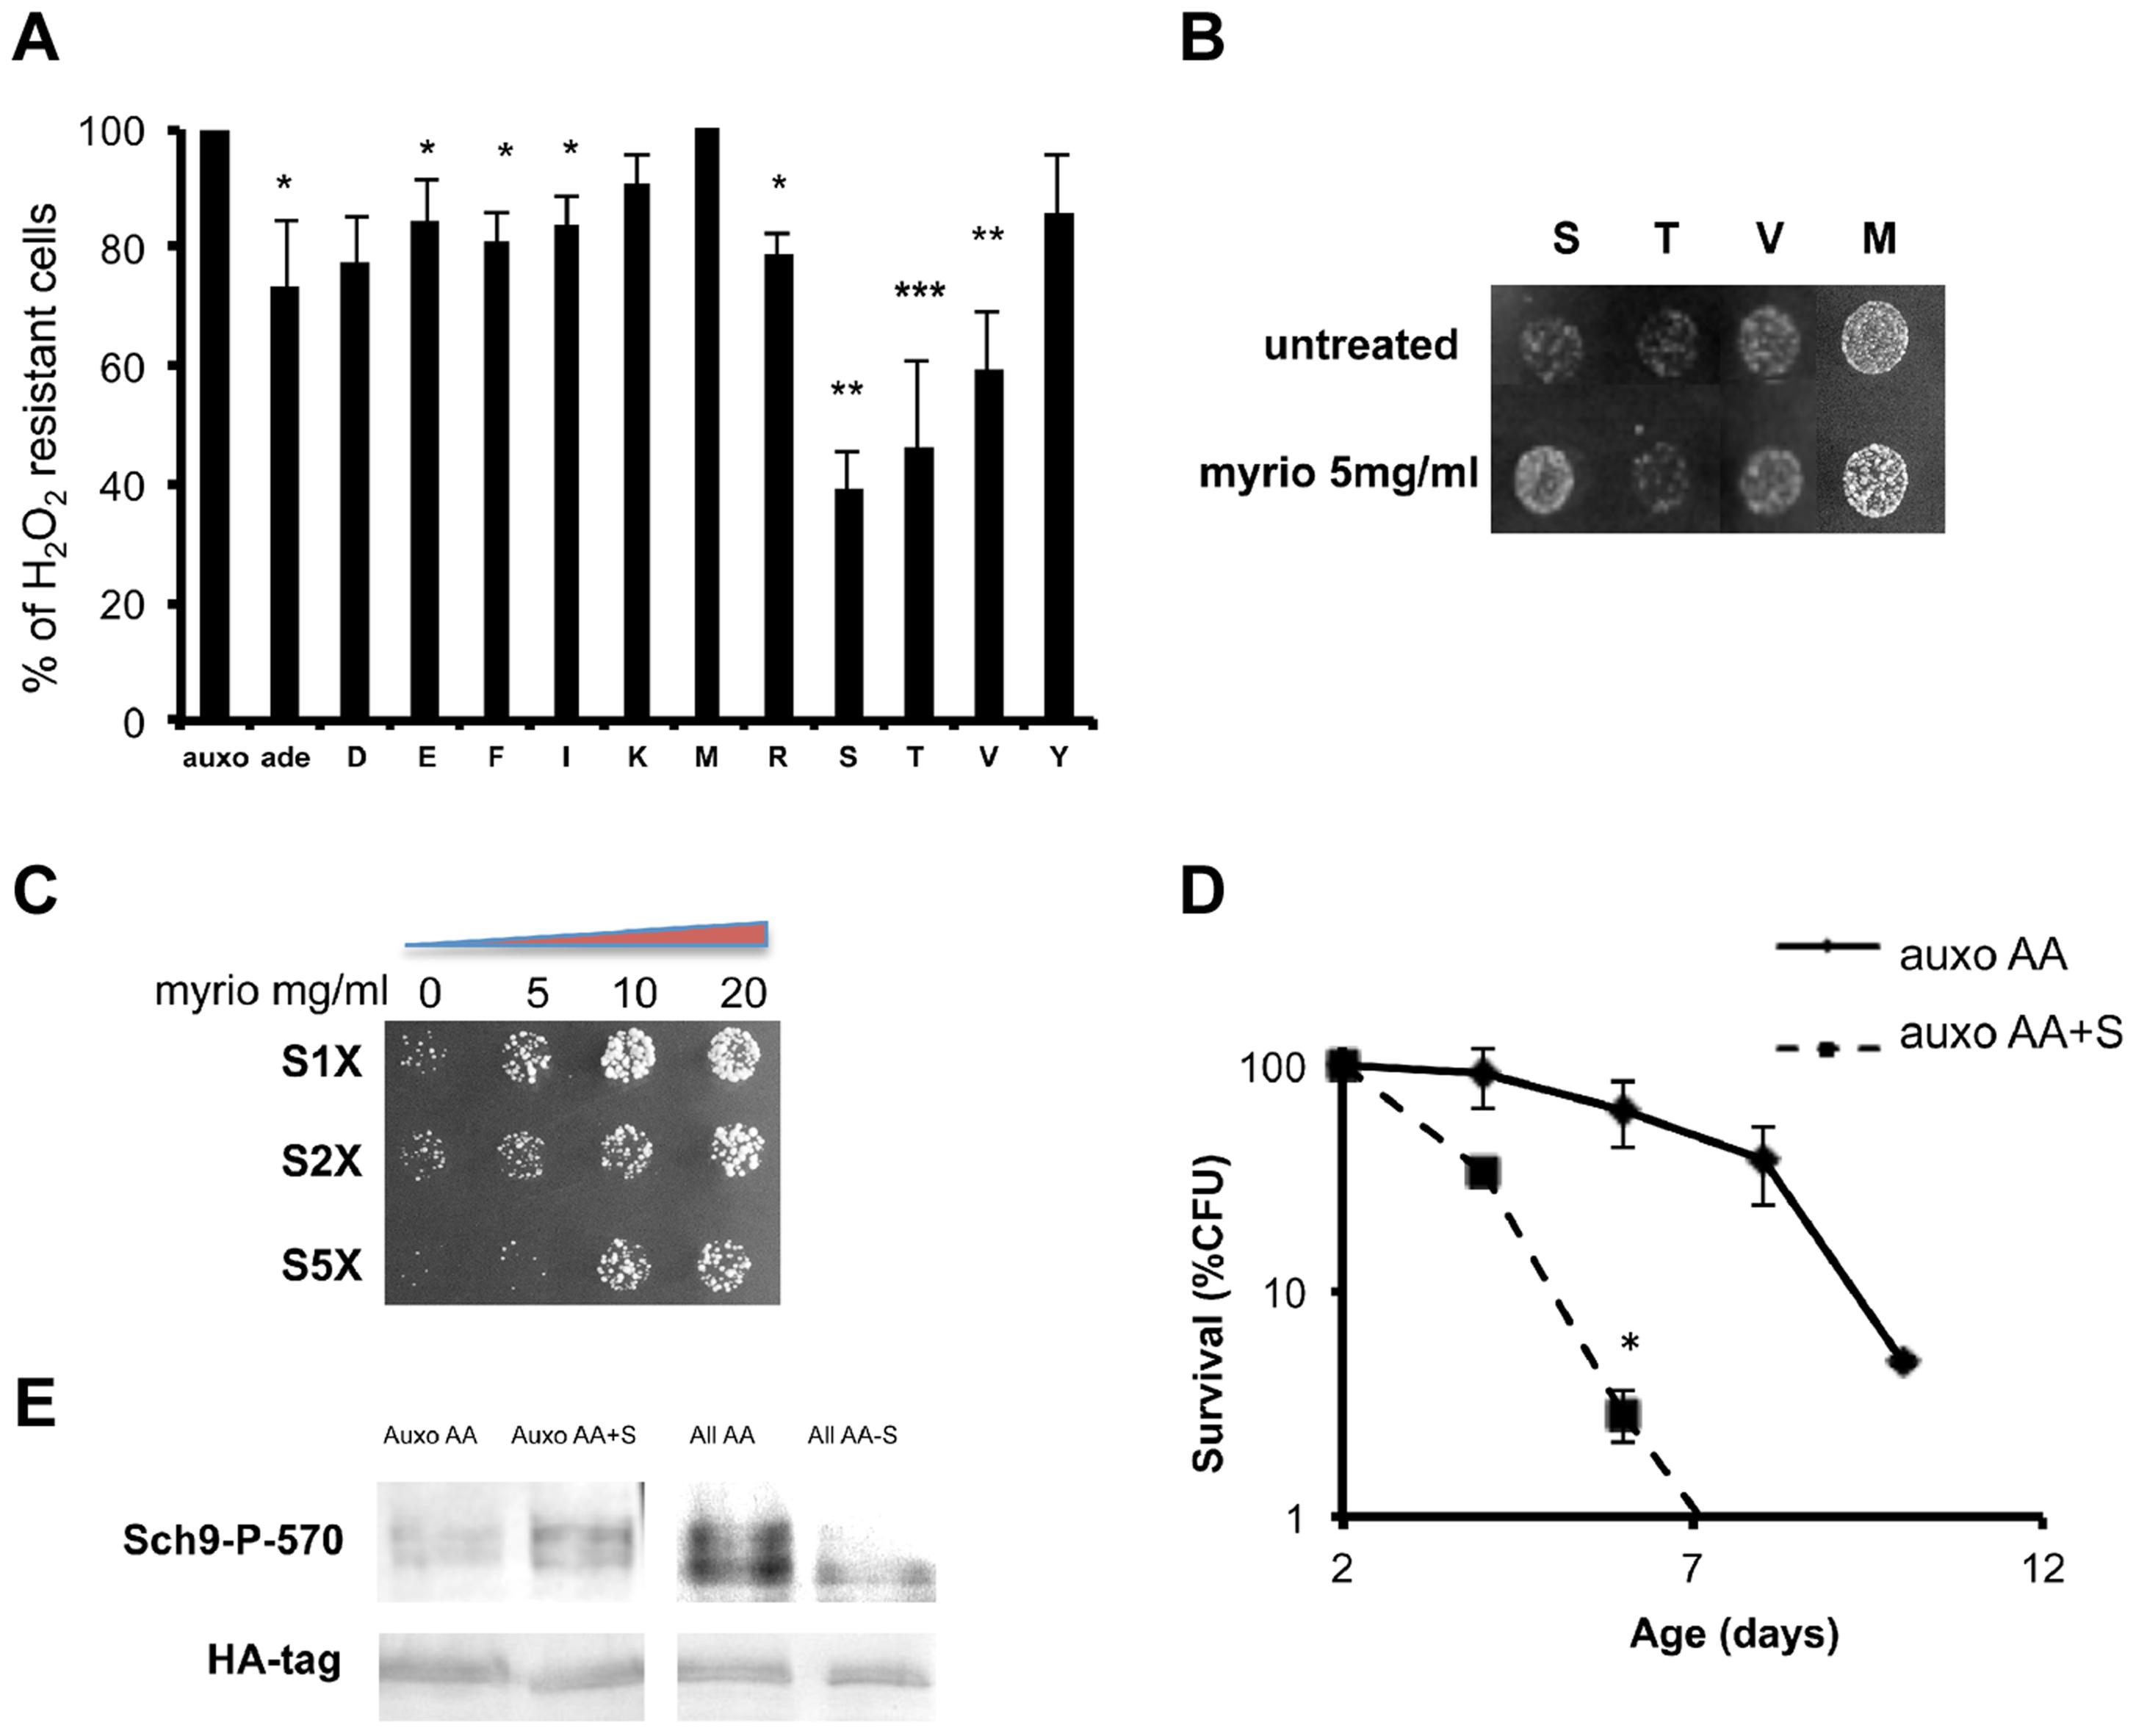 Role of single amino acids in stress sensitization.